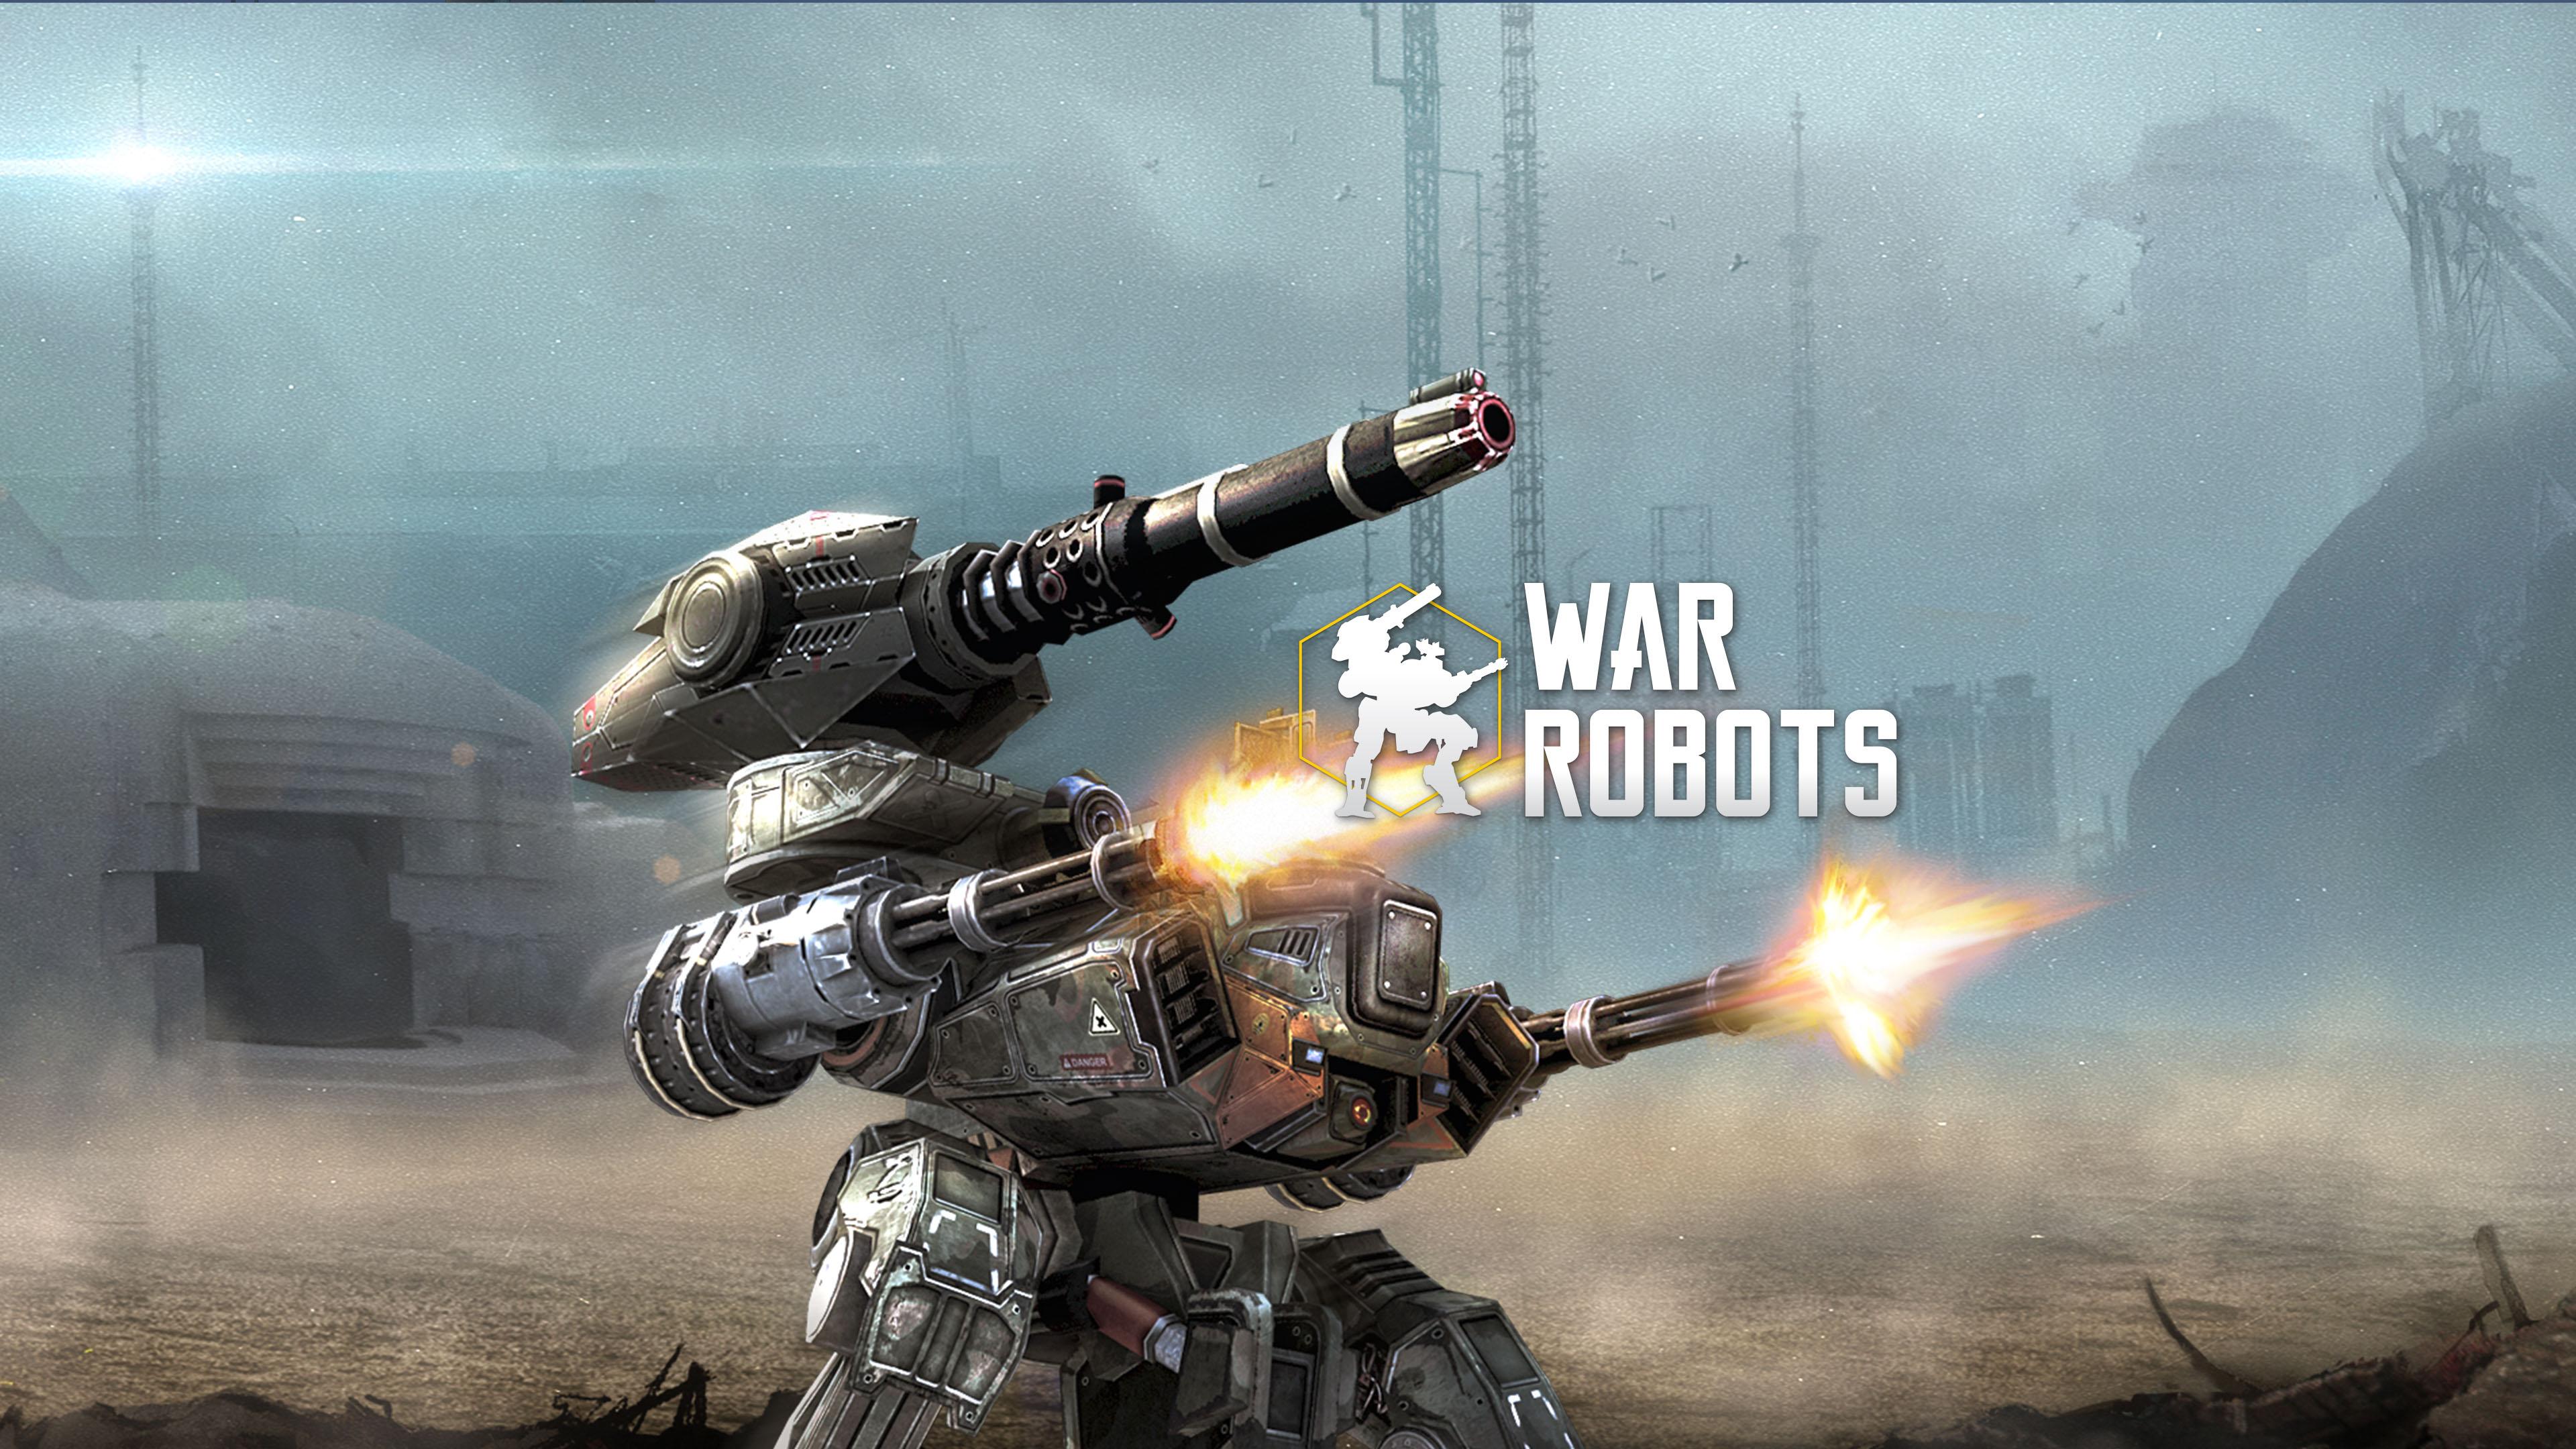 War Robots Wallpaper Hd 3840x2160 Wallpaper Teahub Io